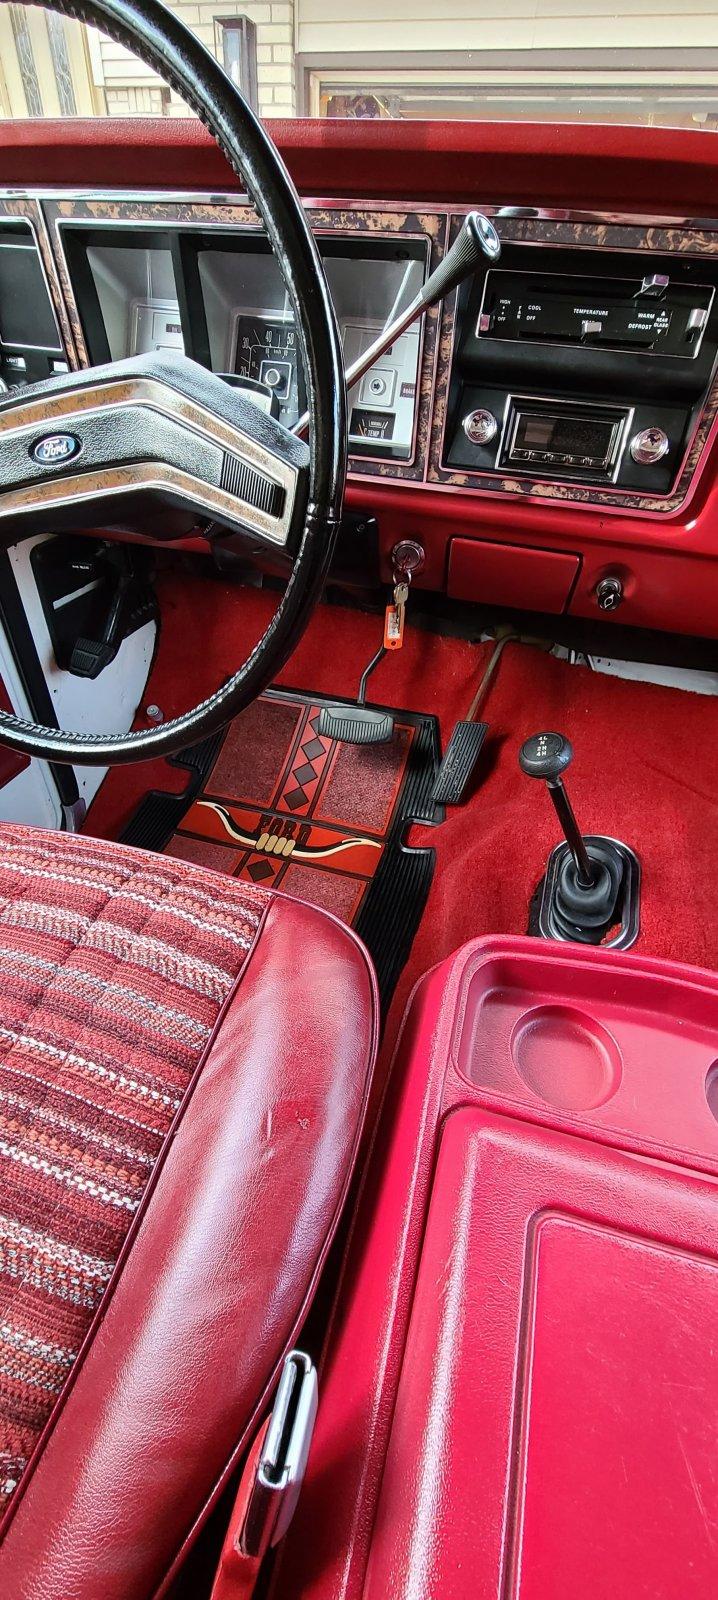 1979 Ford Bronco Ranger XLT Trailer Special - For Sale 5.JPG